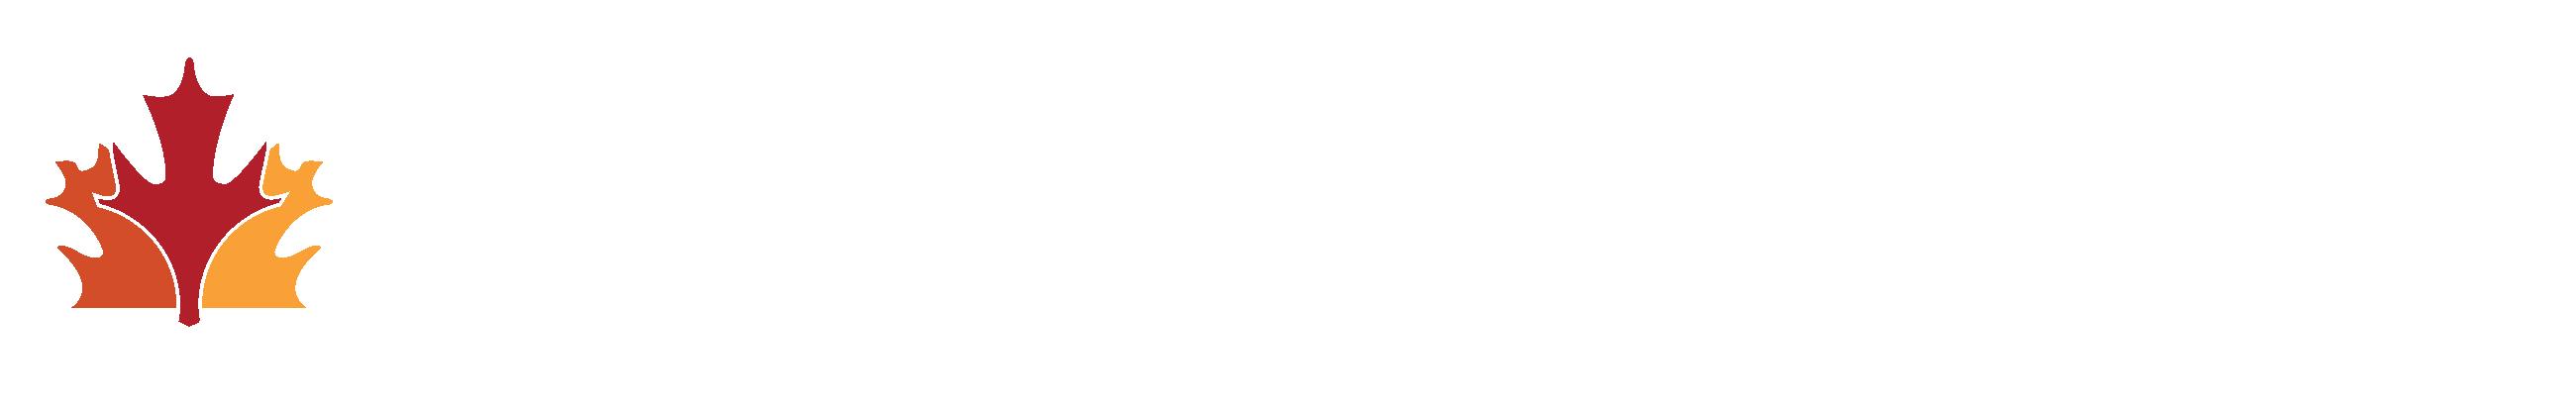 Muleåsen_logo vertikal